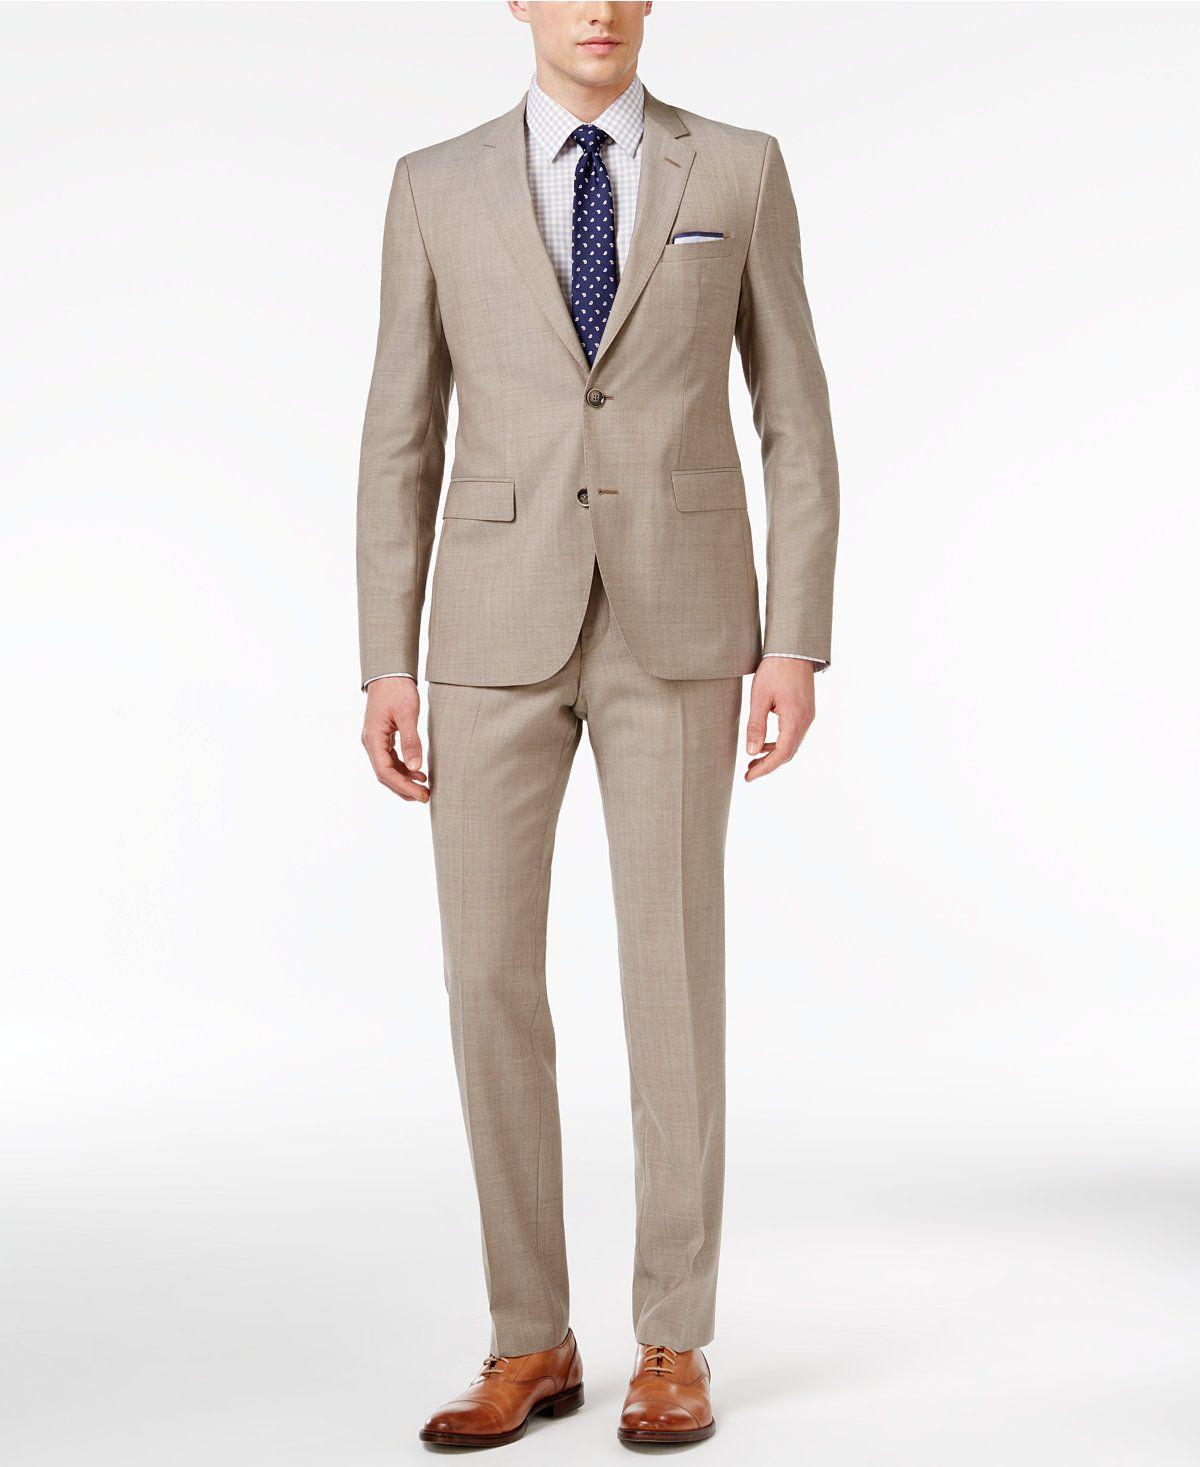 d3424eef1 HUGO Men's Slim-Fit Tan Suit - Suits & Suit Separates - Men - Macy's ...